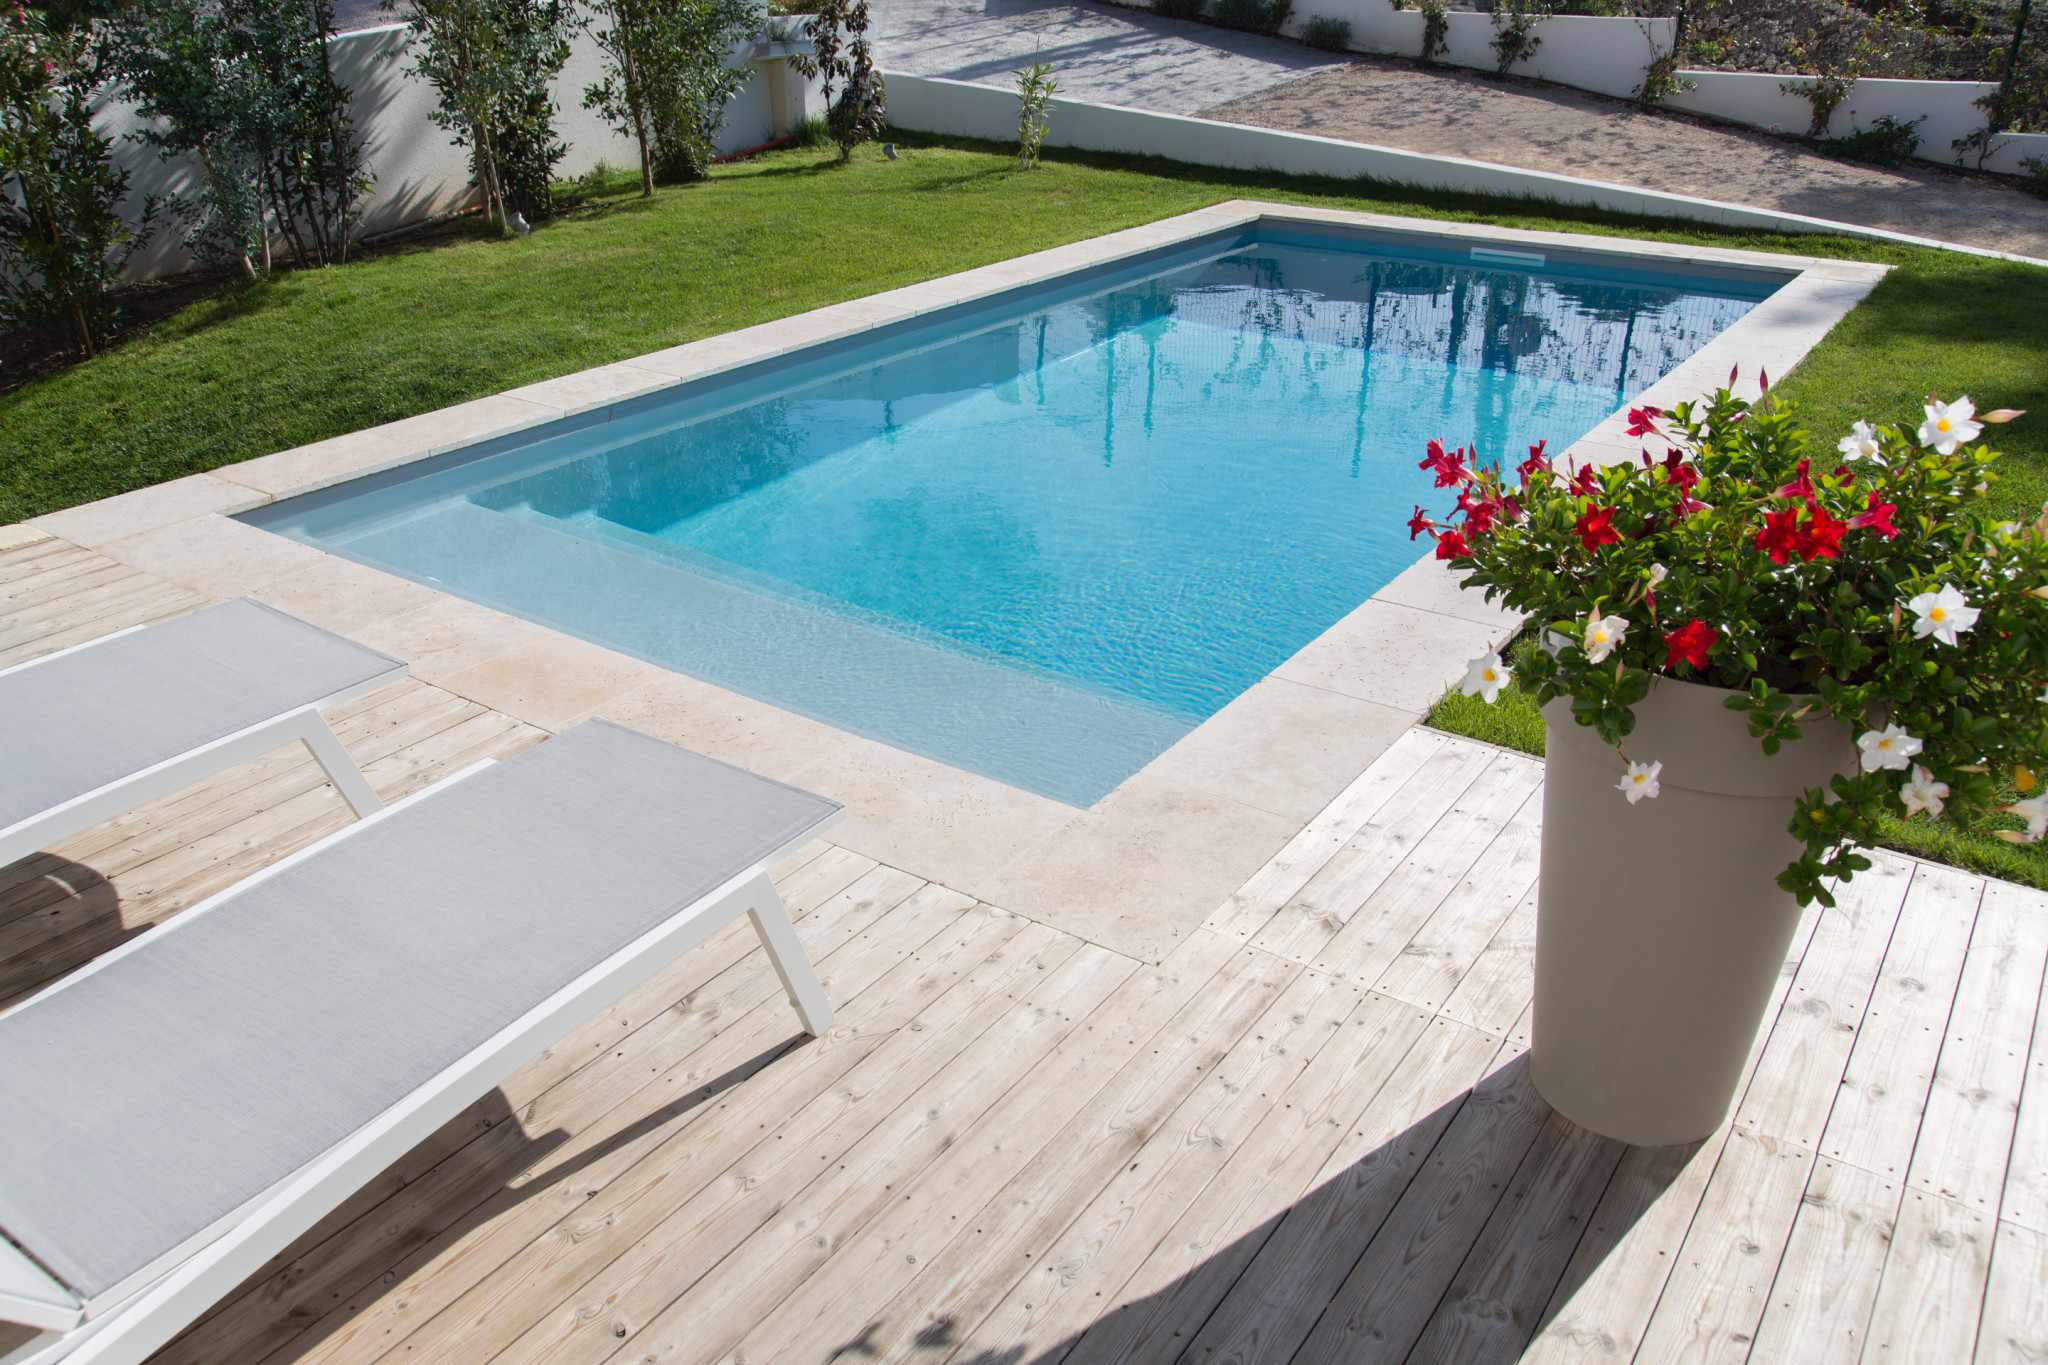 piscine coque aix en provence